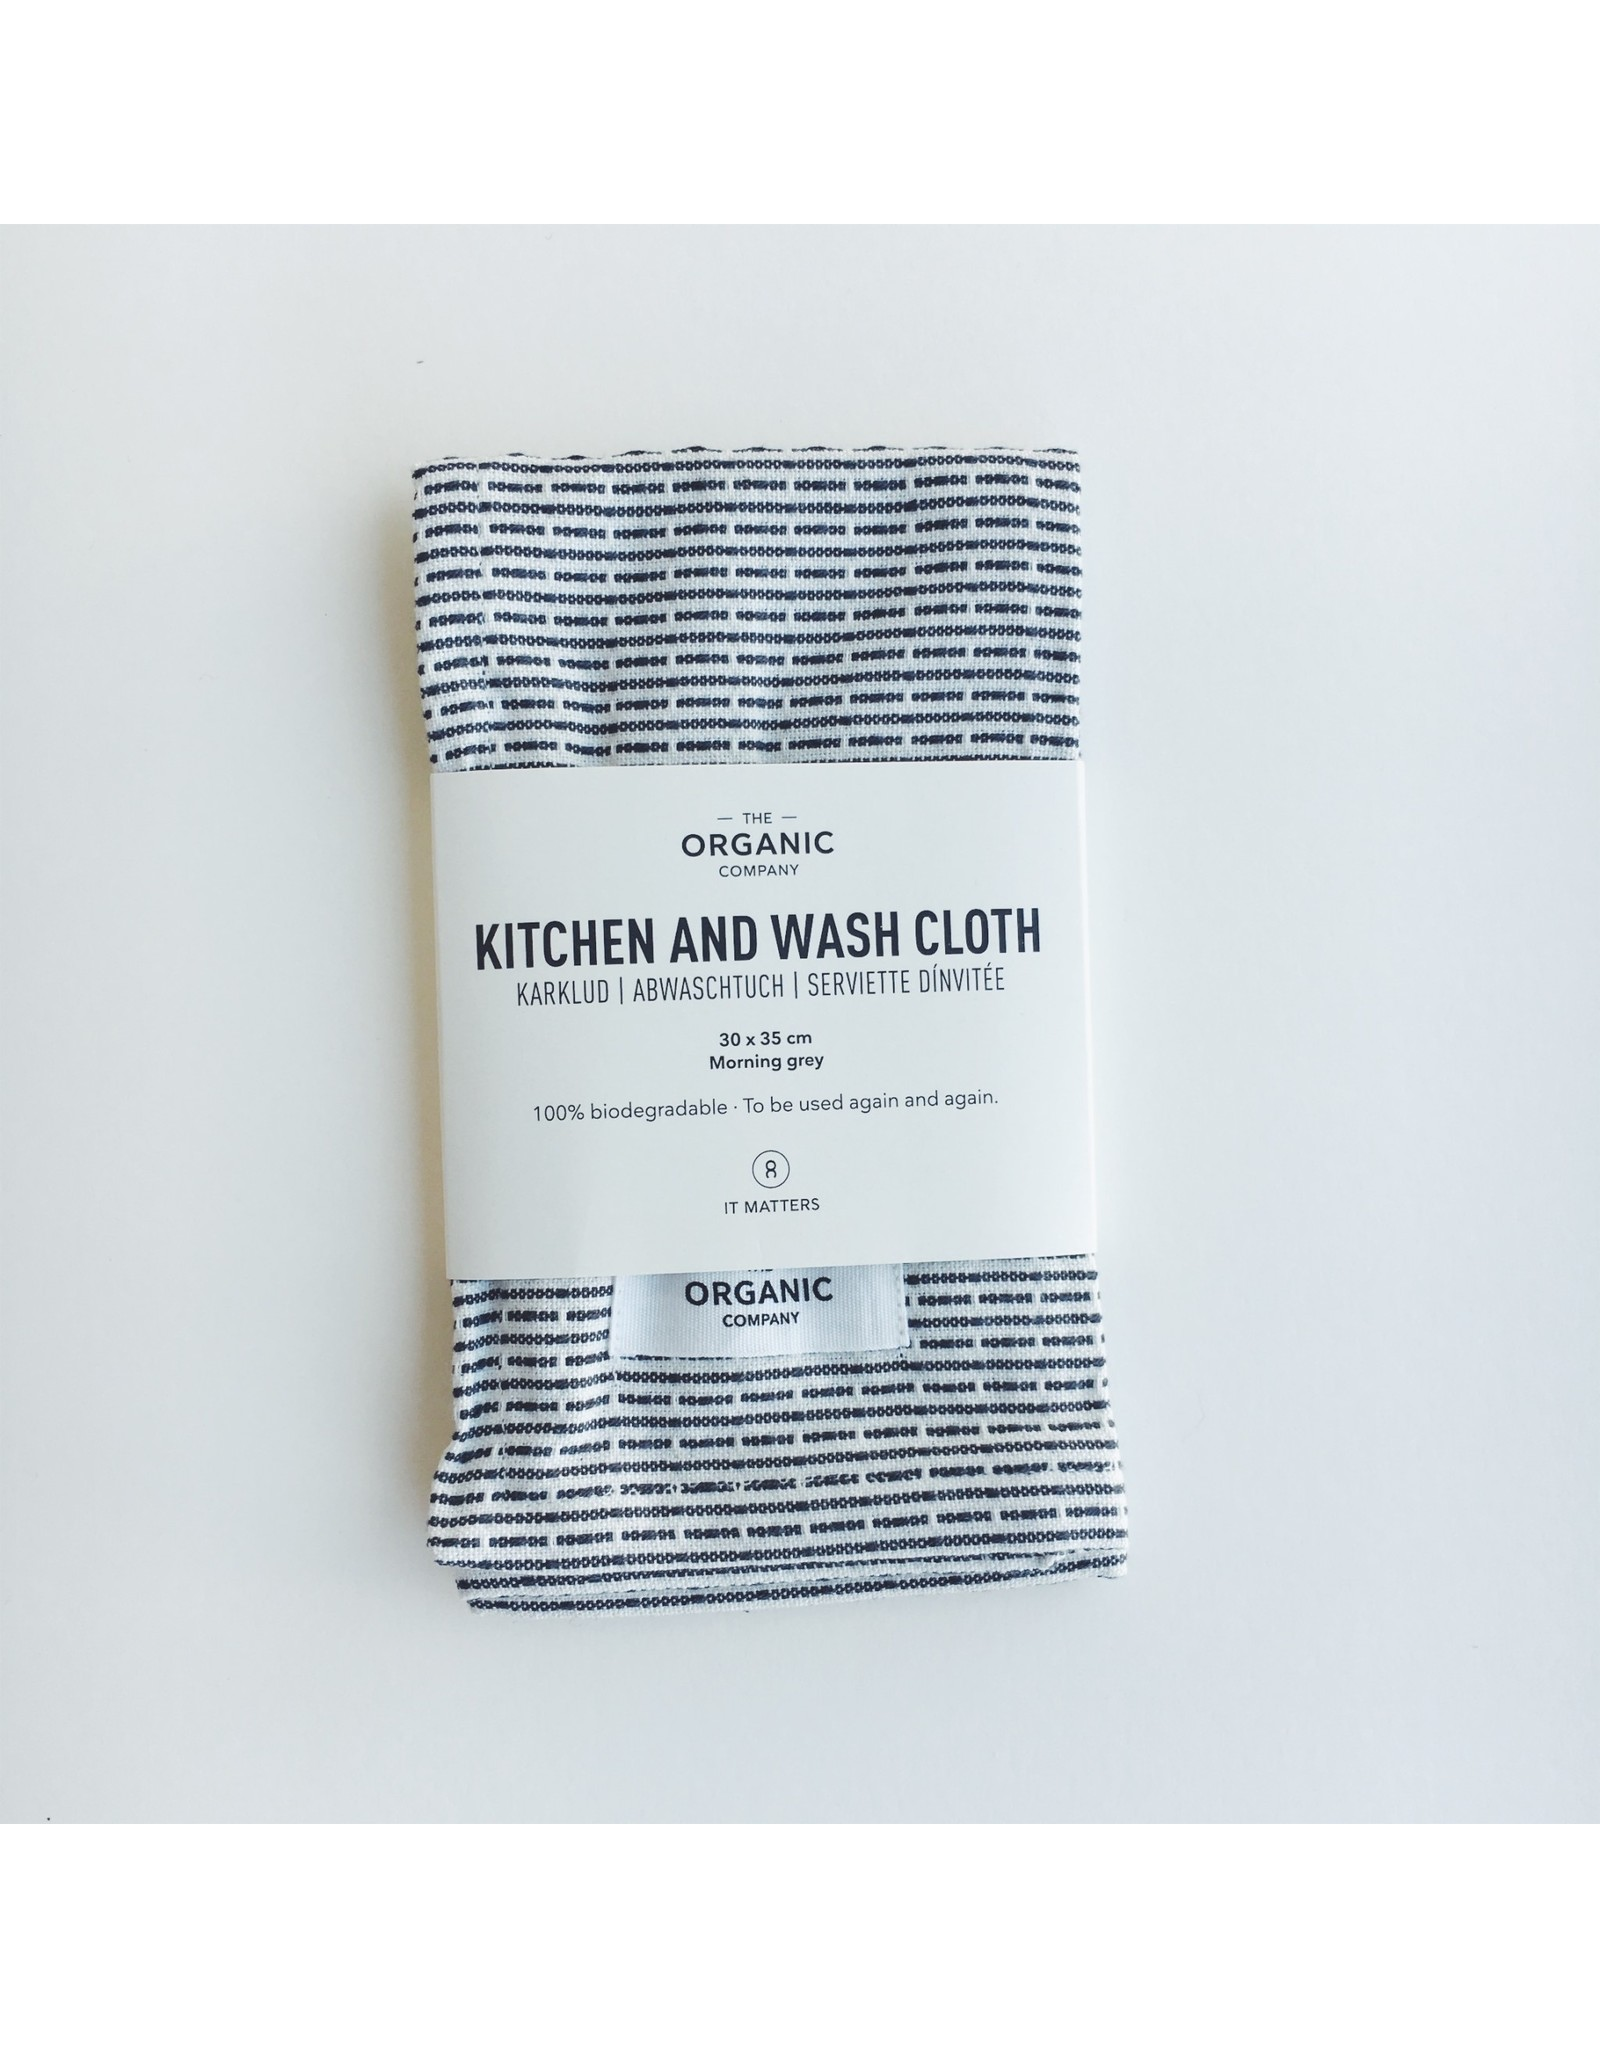 Organic Kitchen and Wash Cloth